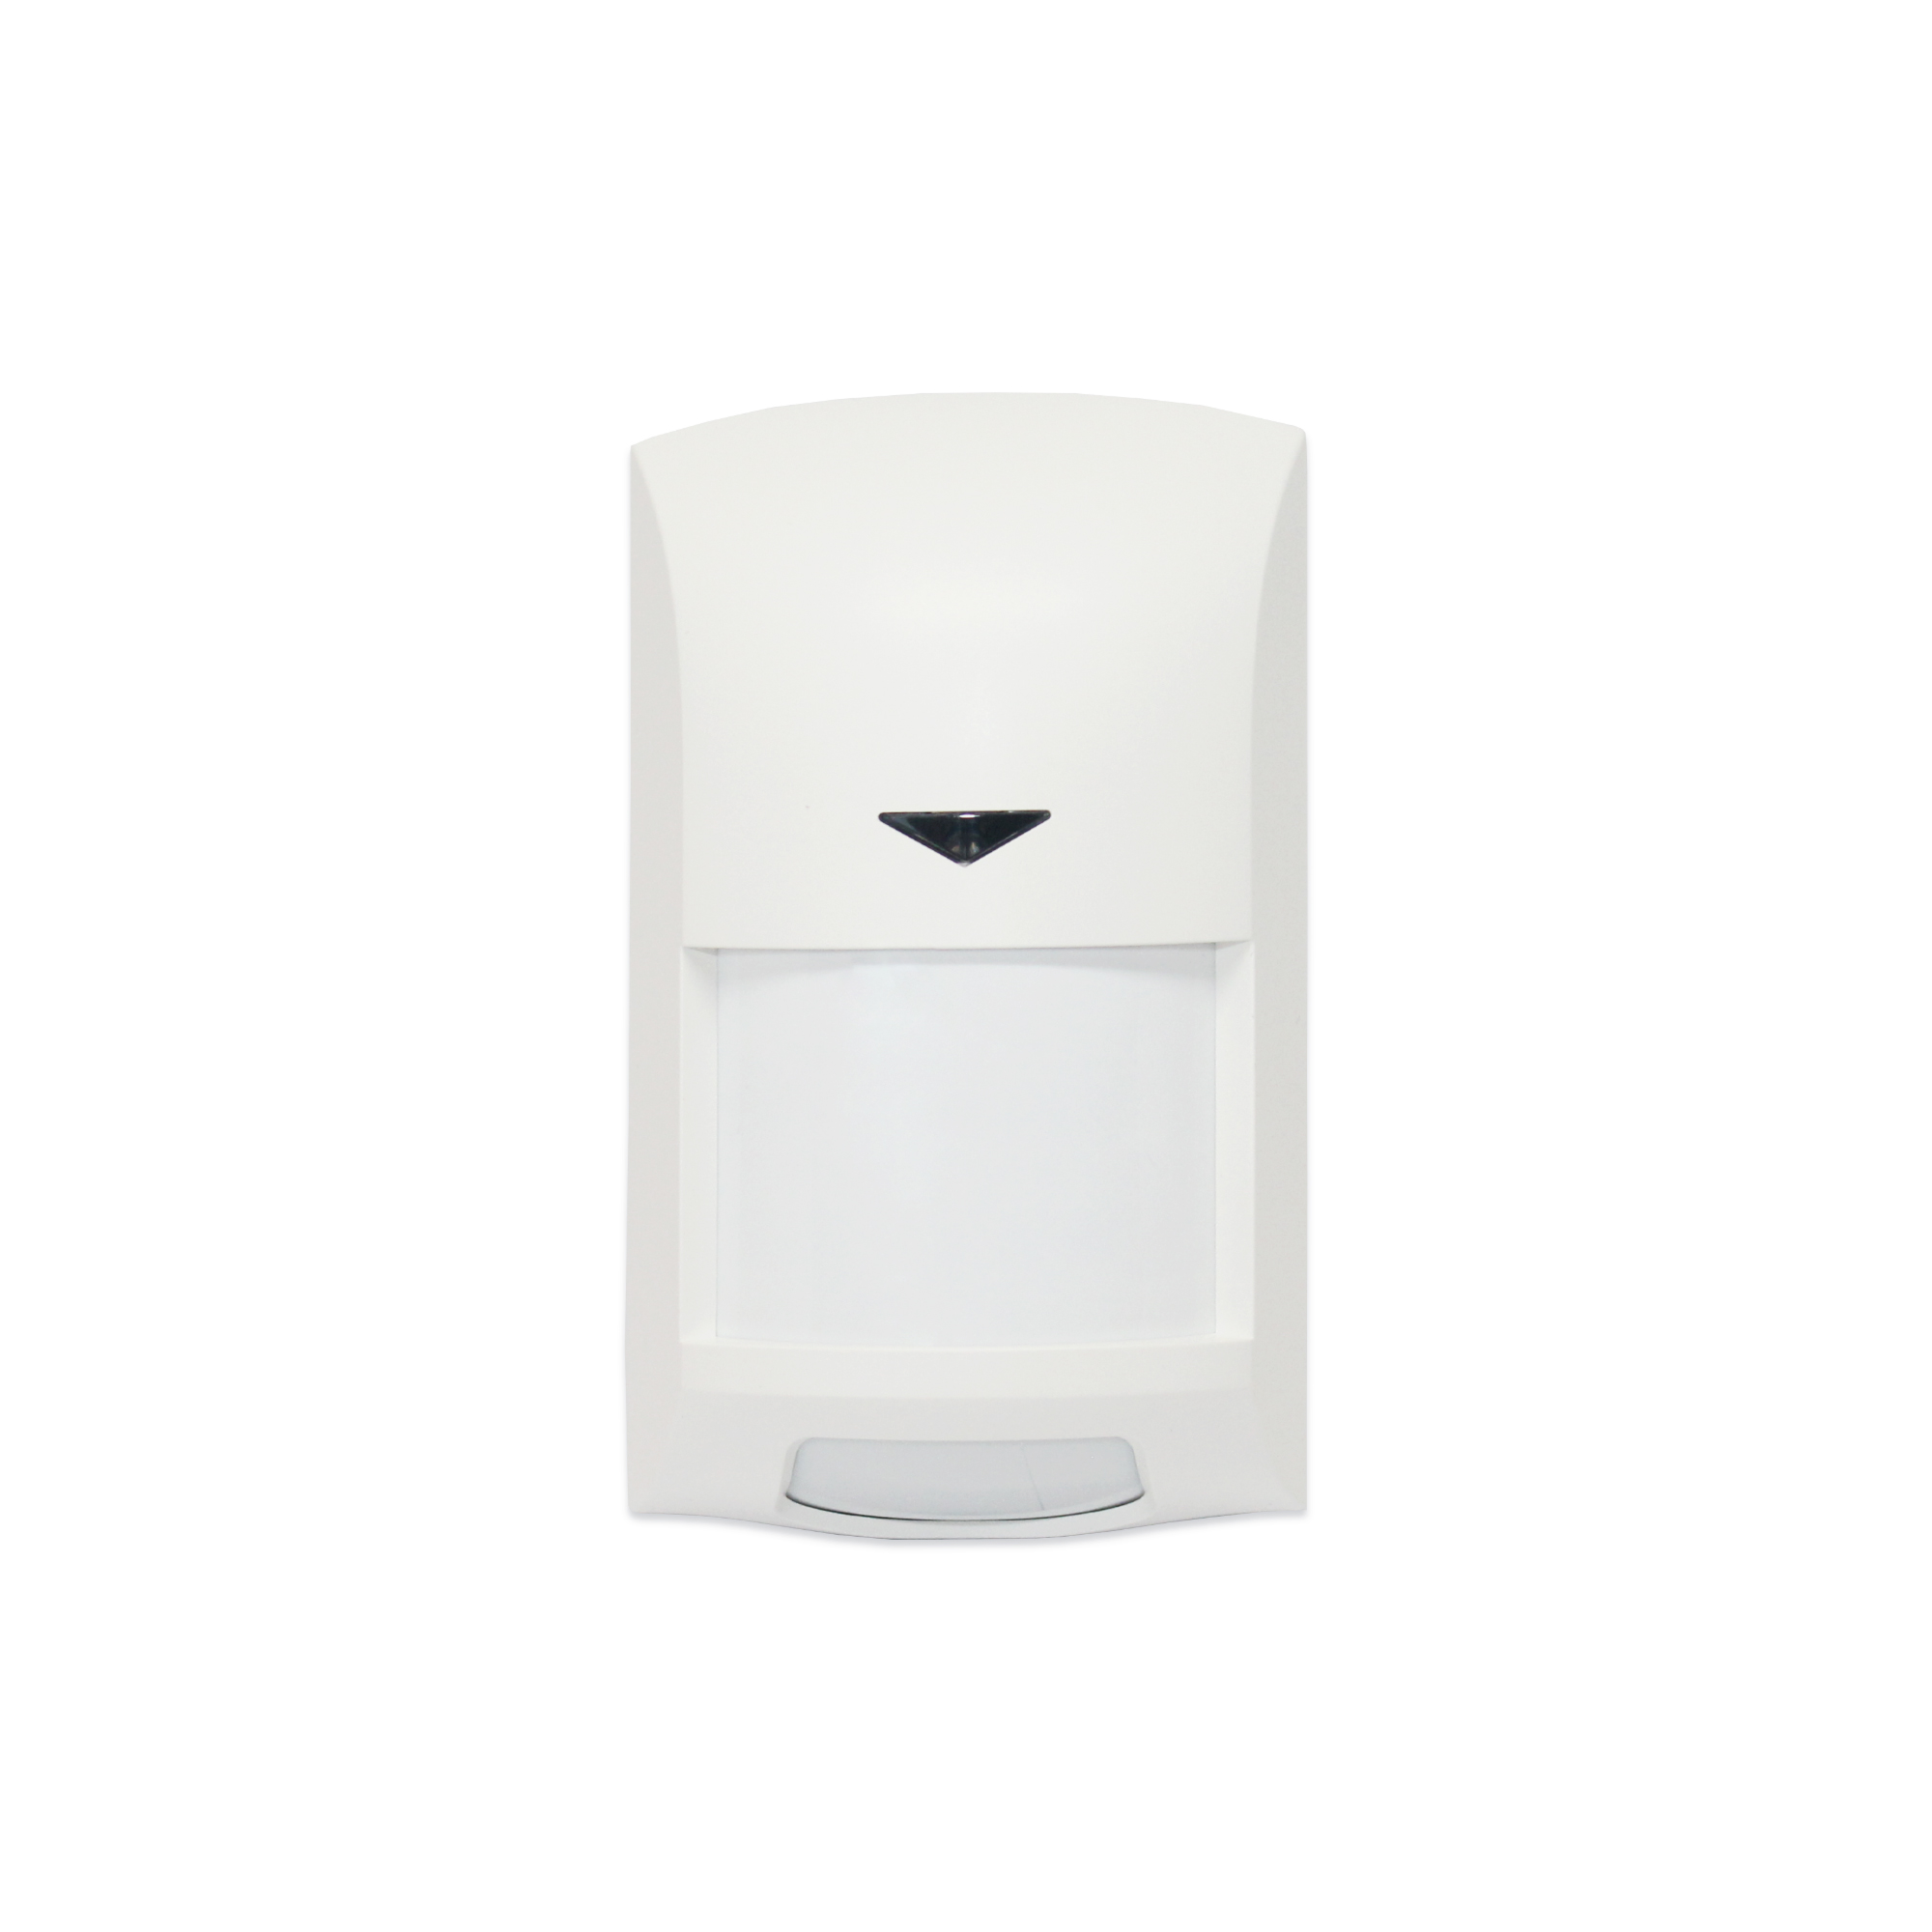 Sensref Wall Mounted Passive Infrared Motion Sensor